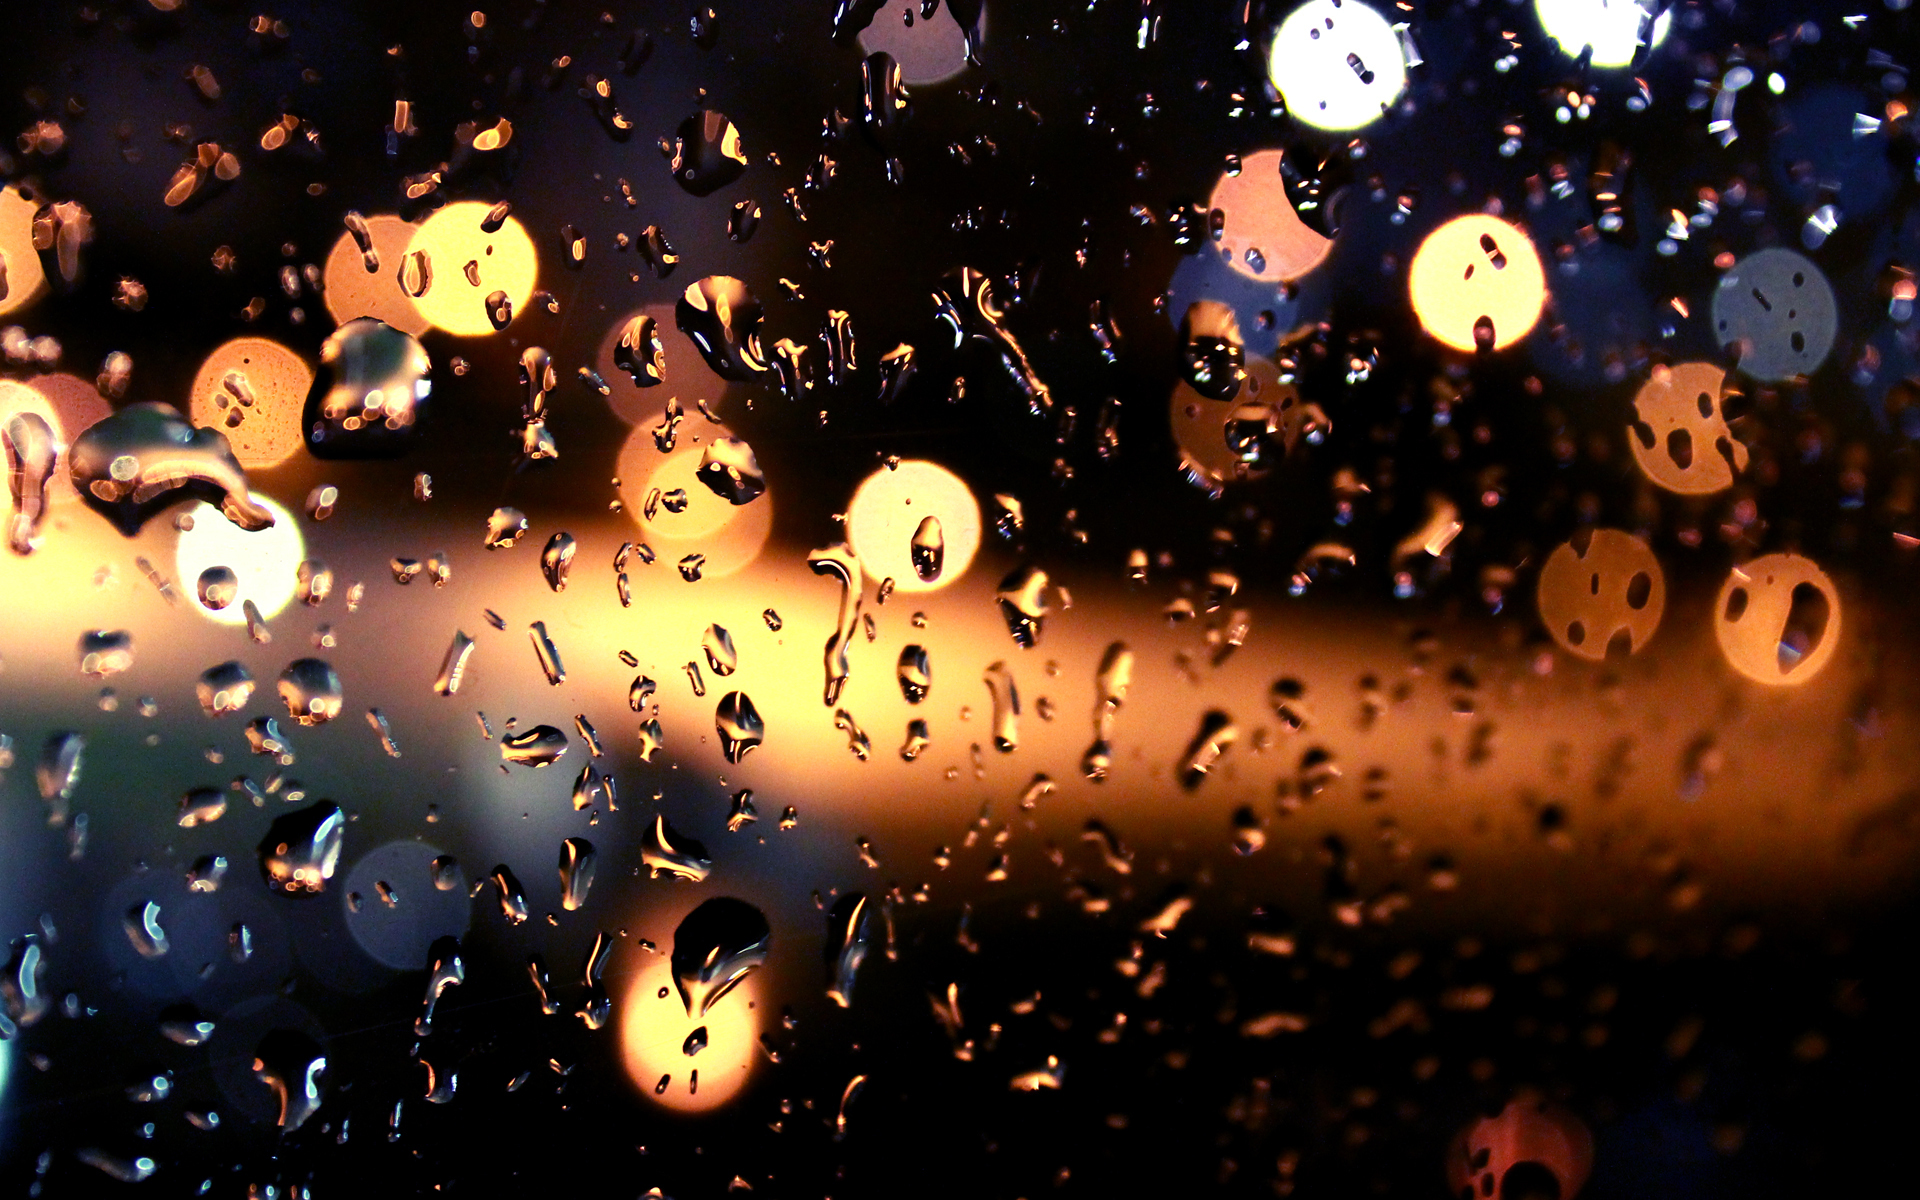 Iphone wallpaper blur - Raindrops Computer Wallpapers Desktop Backgrounds